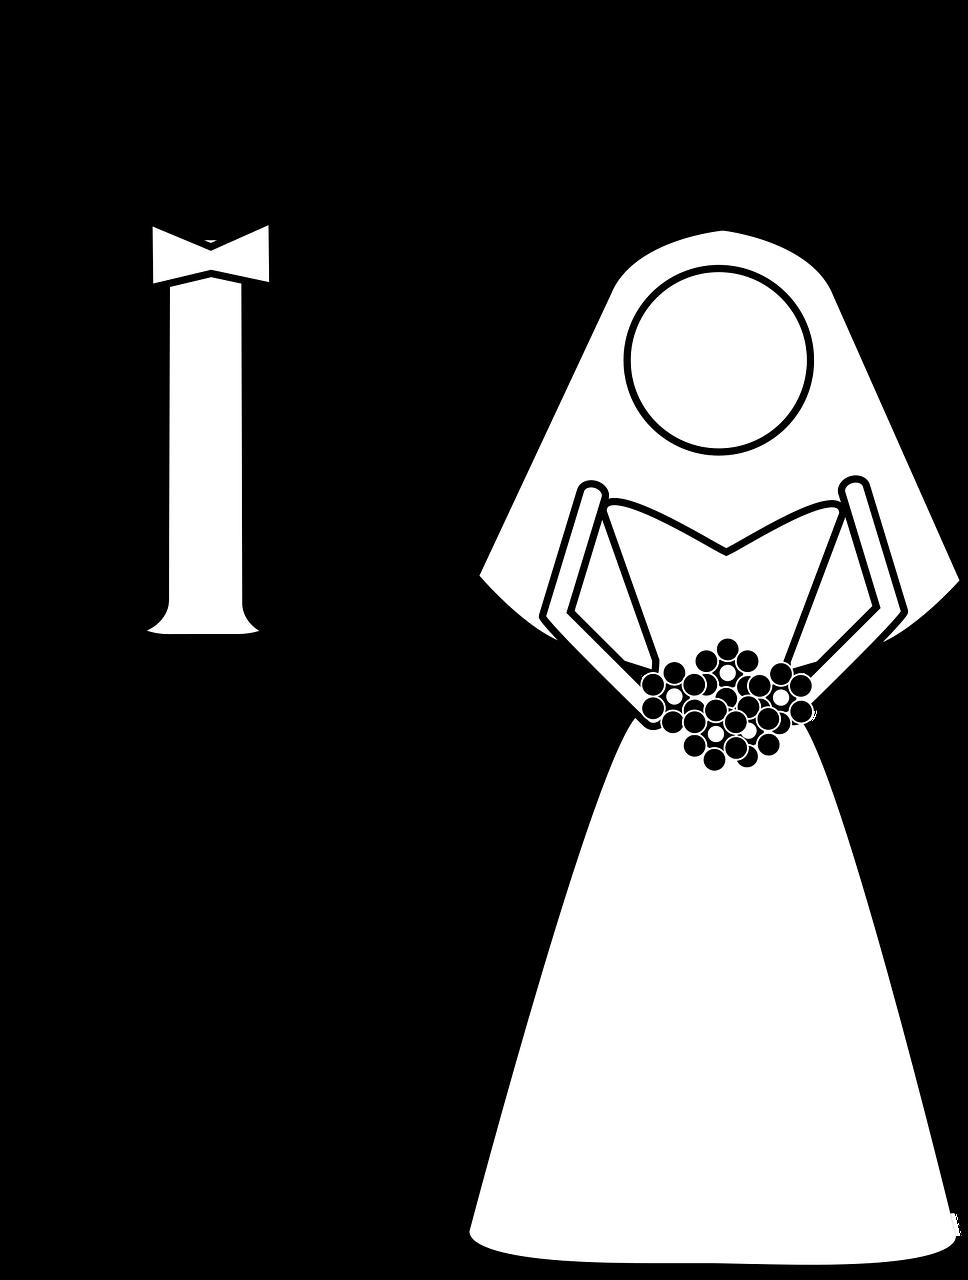 Wedding, Married, Bride, Groom, Vector Graphic wedding,